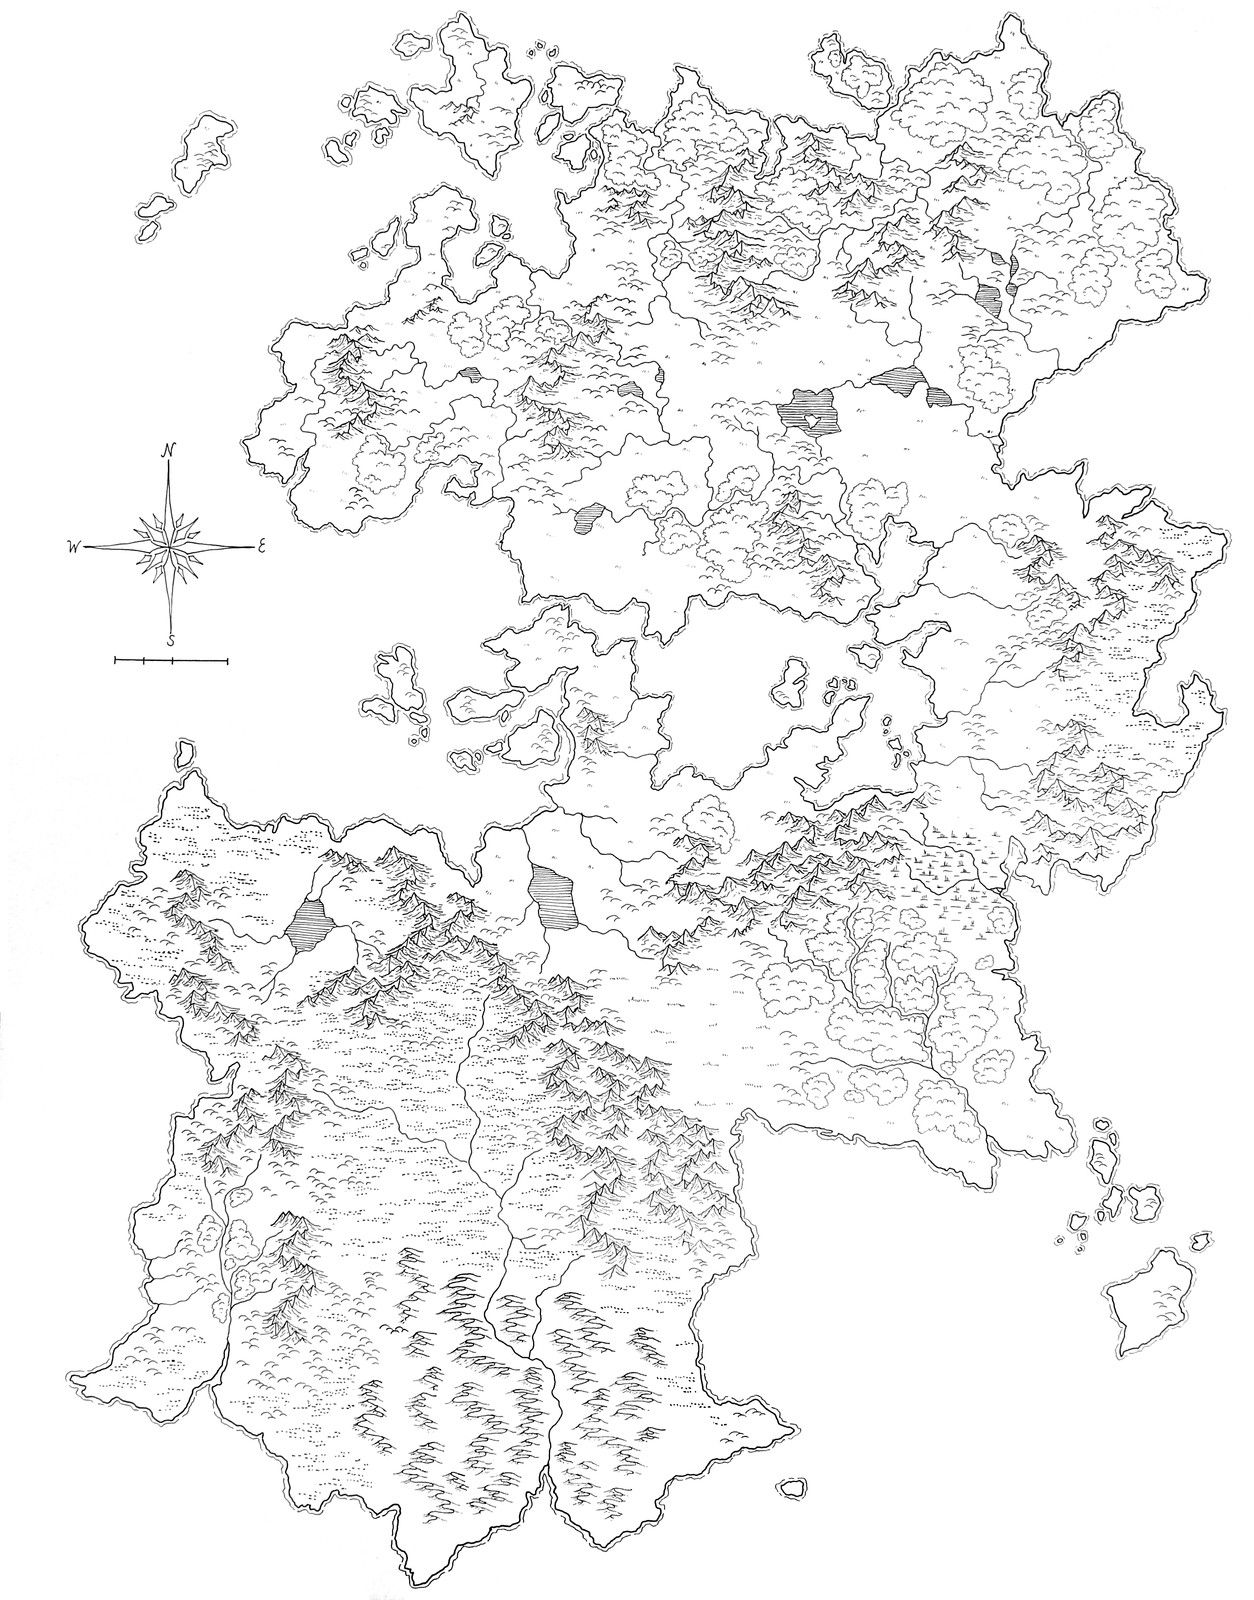 World Map Rpg Maker | Wiring Diagram Database